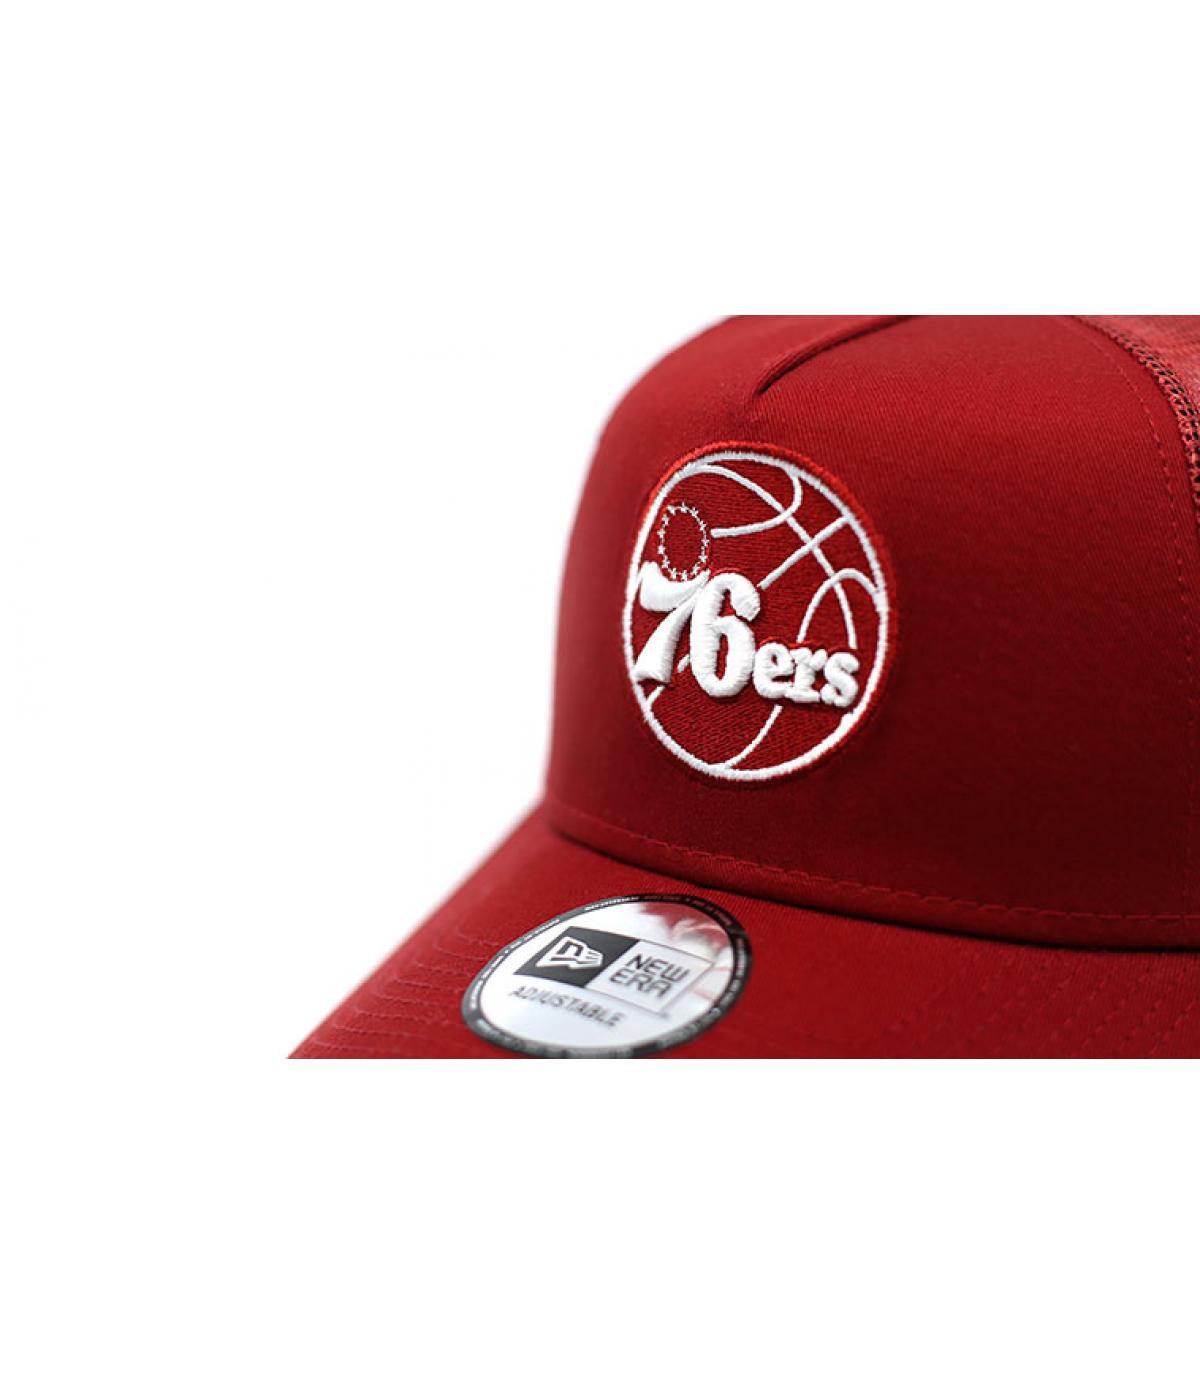 Details Trucker NBA Ess 76ERS red - afbeeling 3